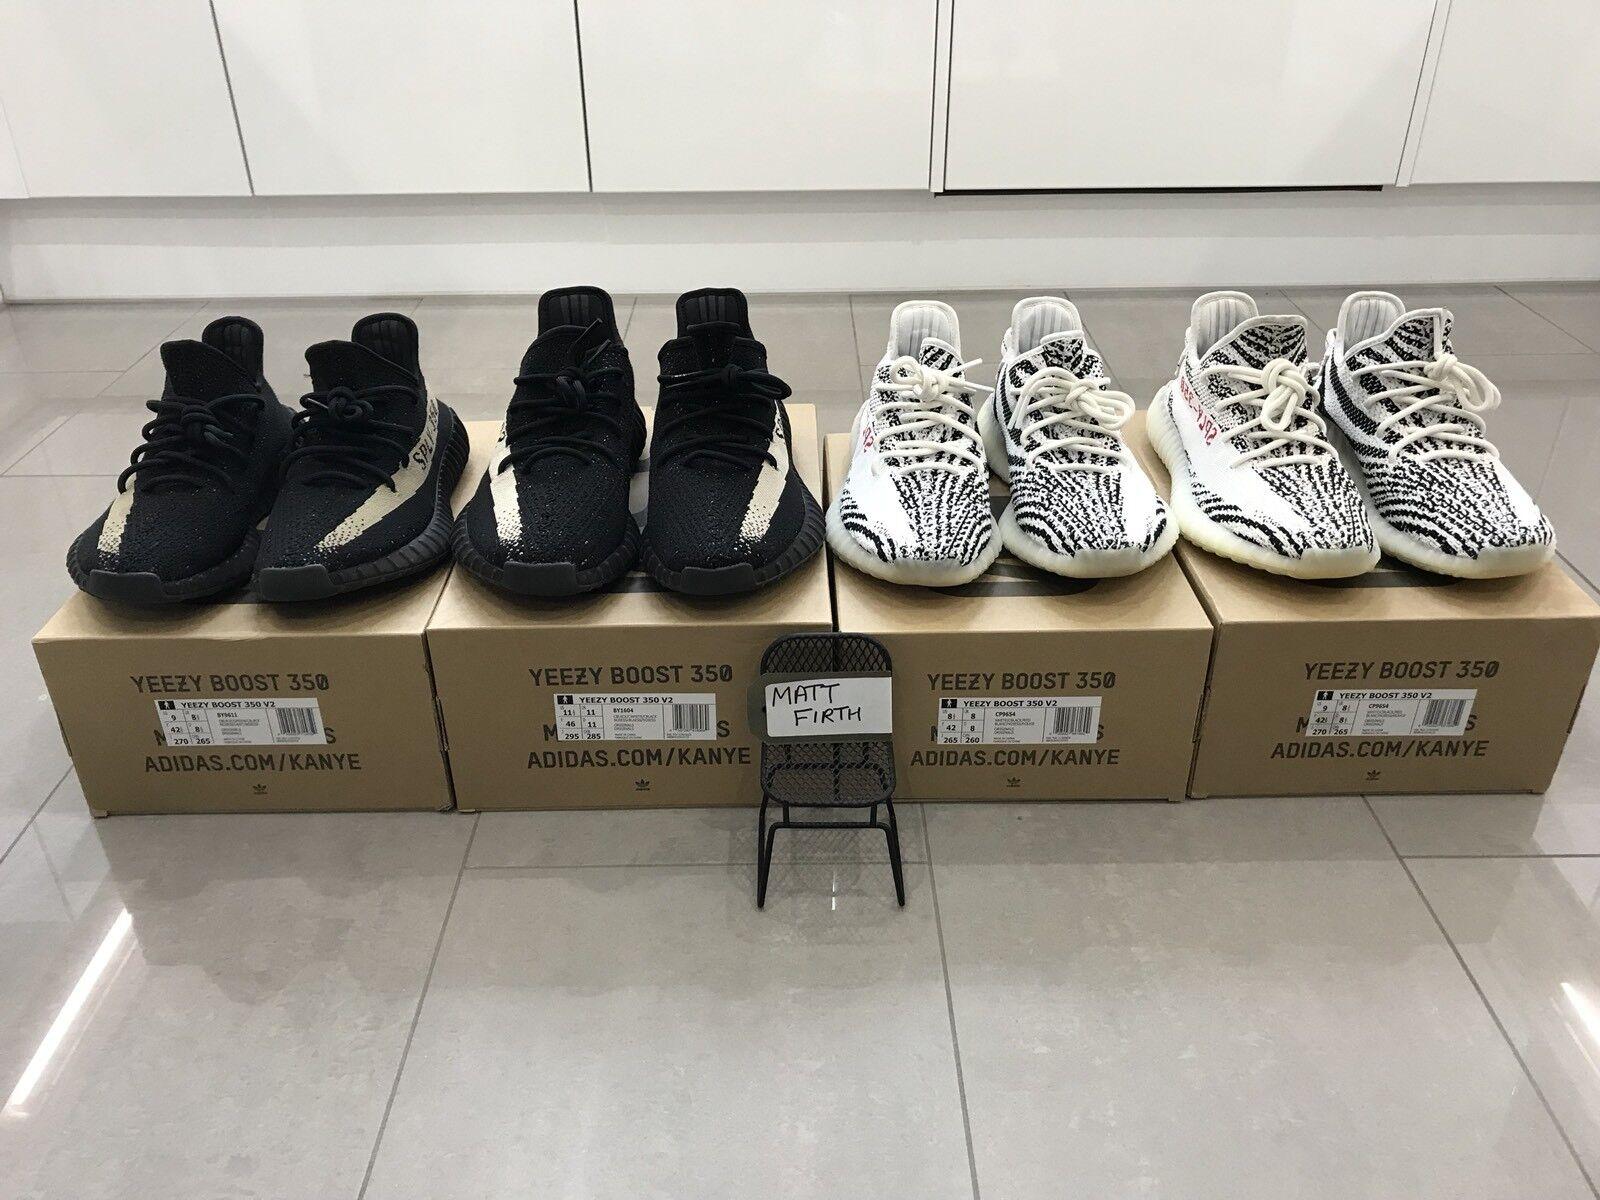 "Adidas Yeezy Boost 350 V2 LEGIT CHECK SERVICE βœ"" ️ 100% ΡπαληθΡύουν το Yeezys ΟƒΞ�μΡρα"